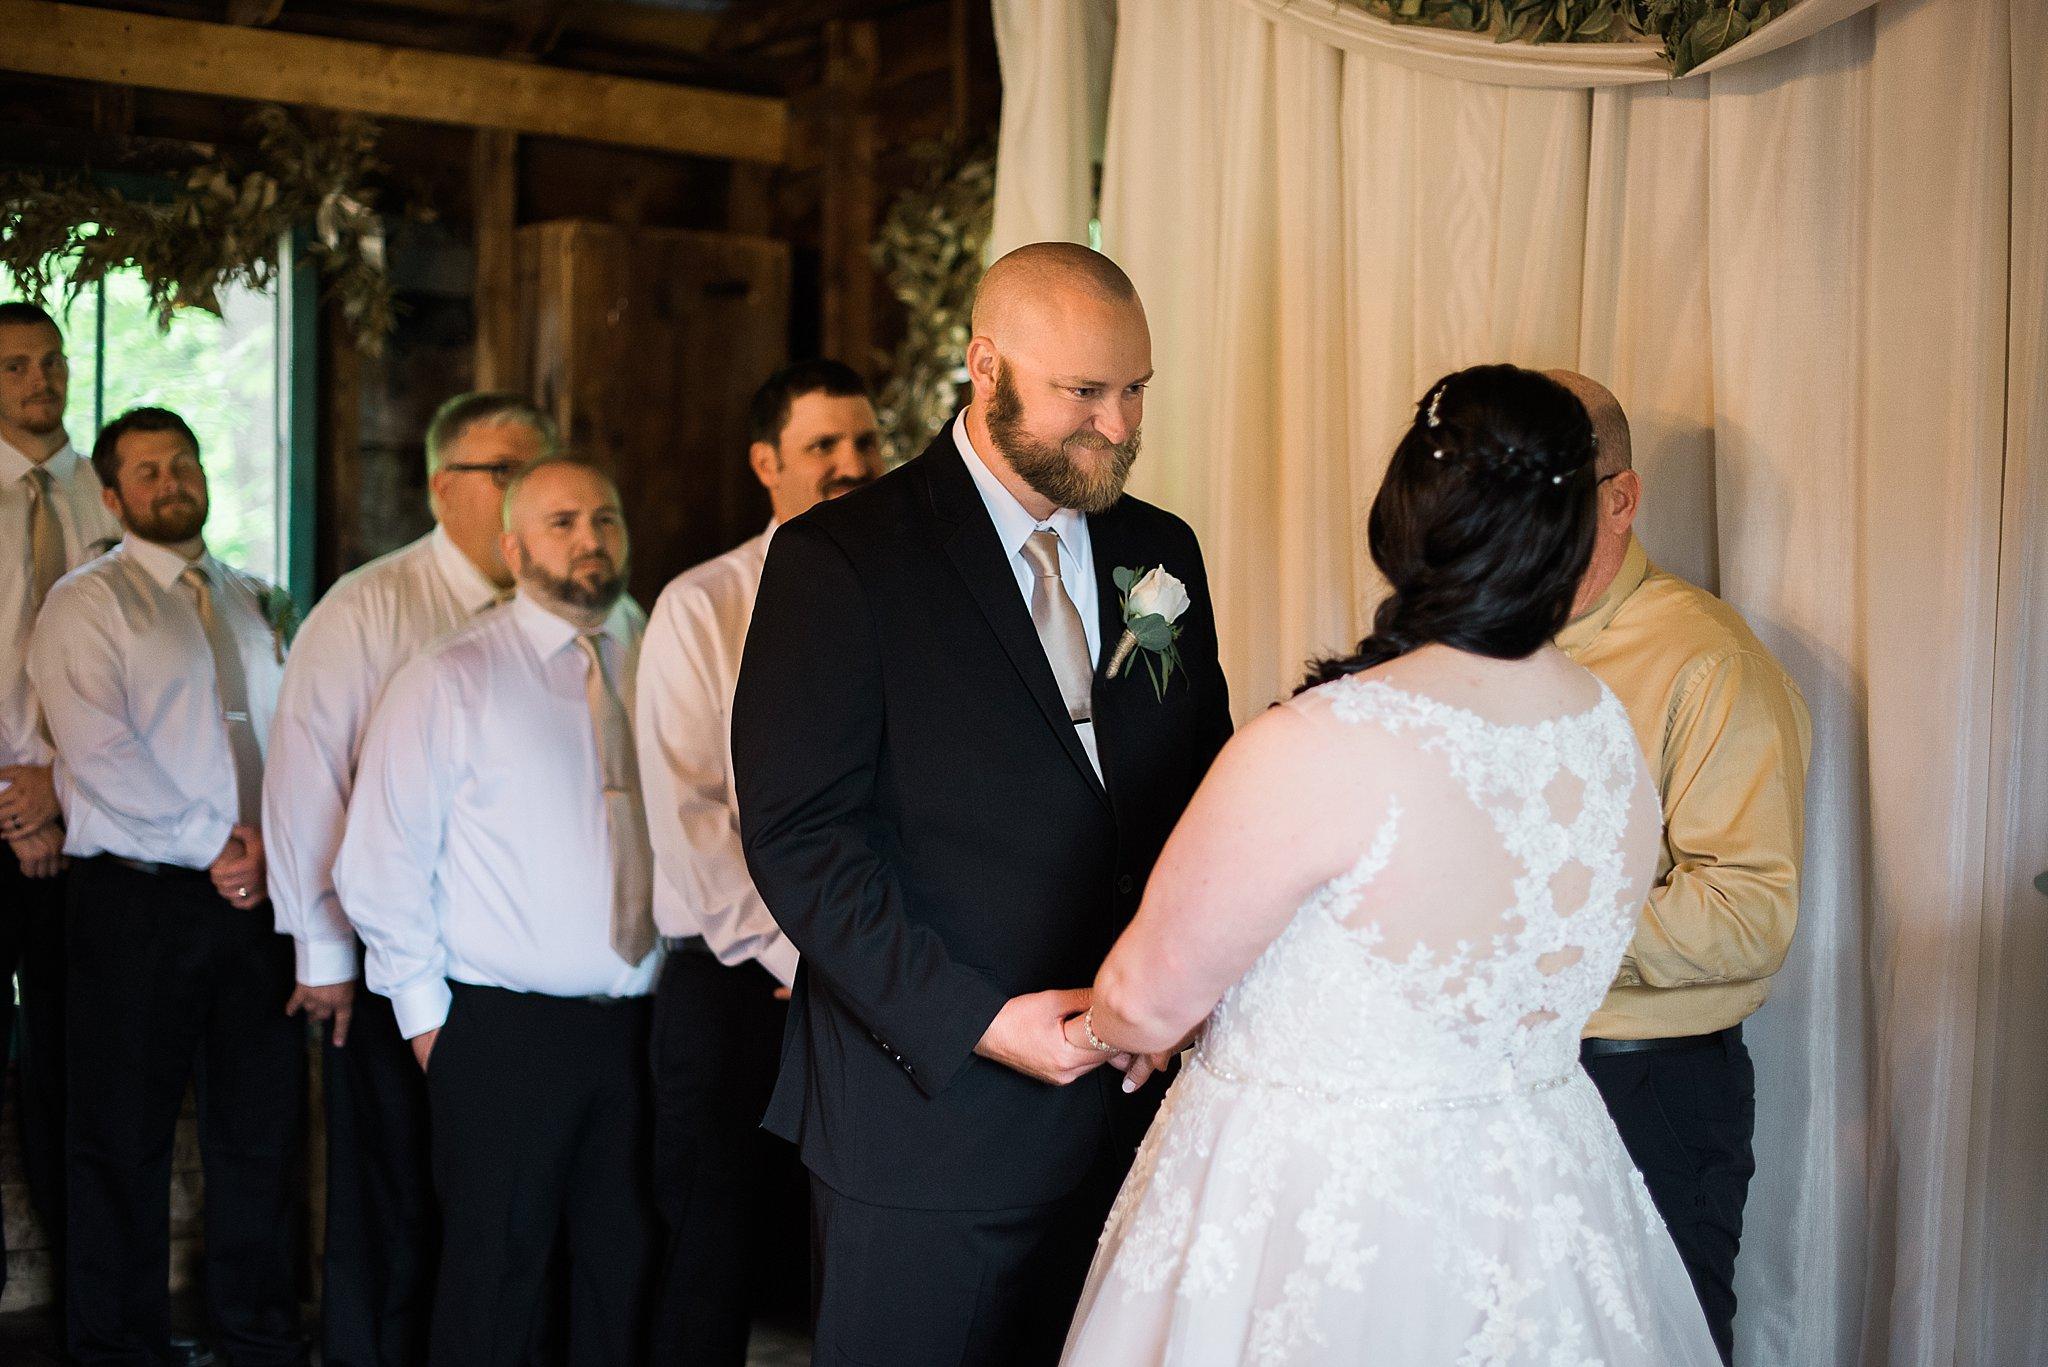 Preserve at Chocorua Tamworth NH Wedding May Wedding New Hampshire Wedding 101.jpg